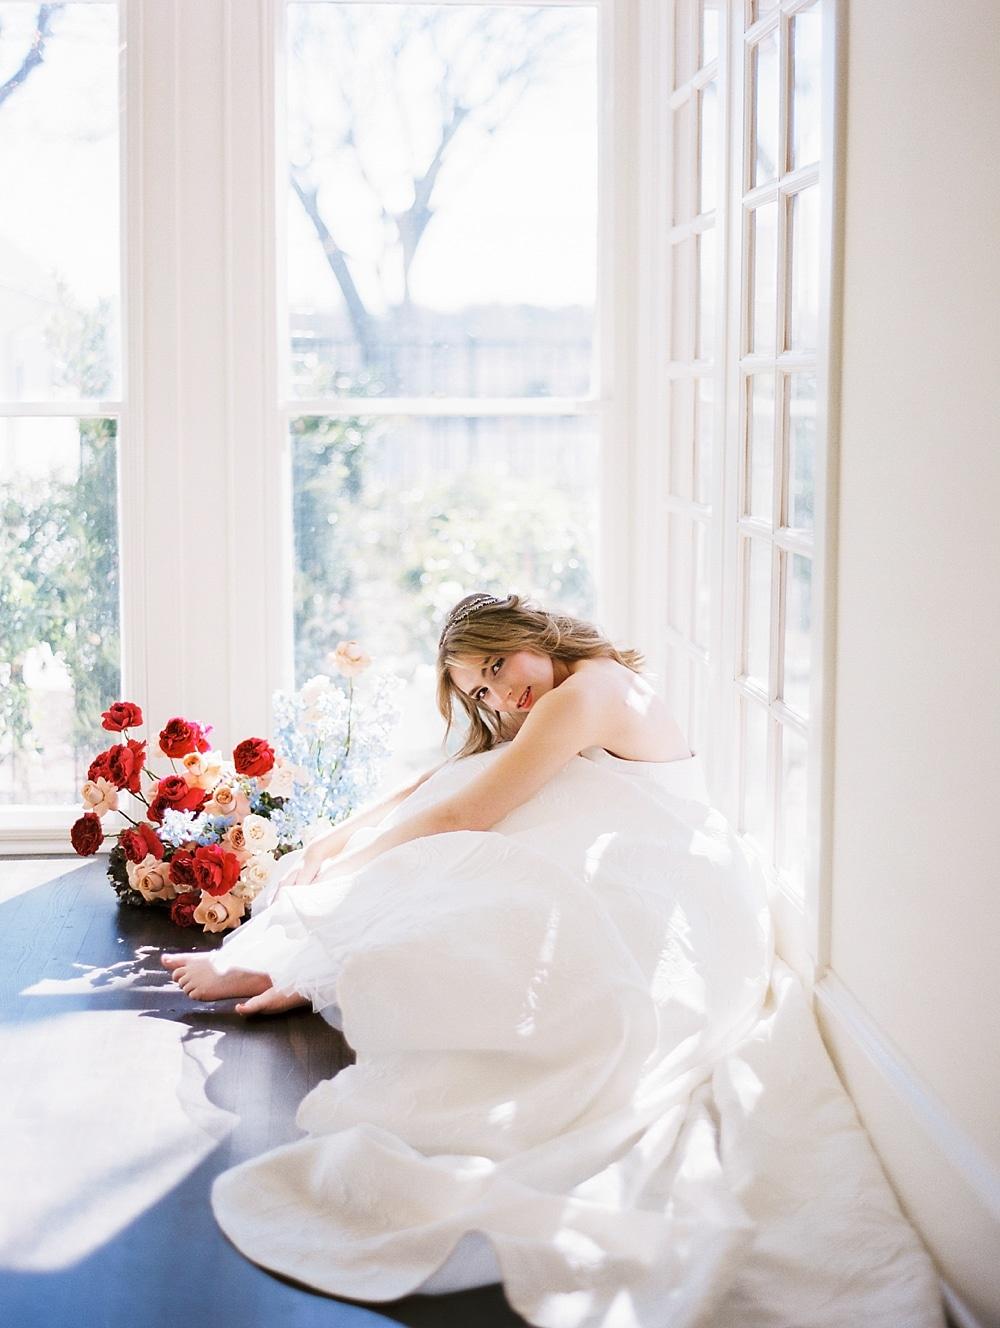 kristin-la-voie-photography-austin-wedding-photographer-woodbine-mansion-76